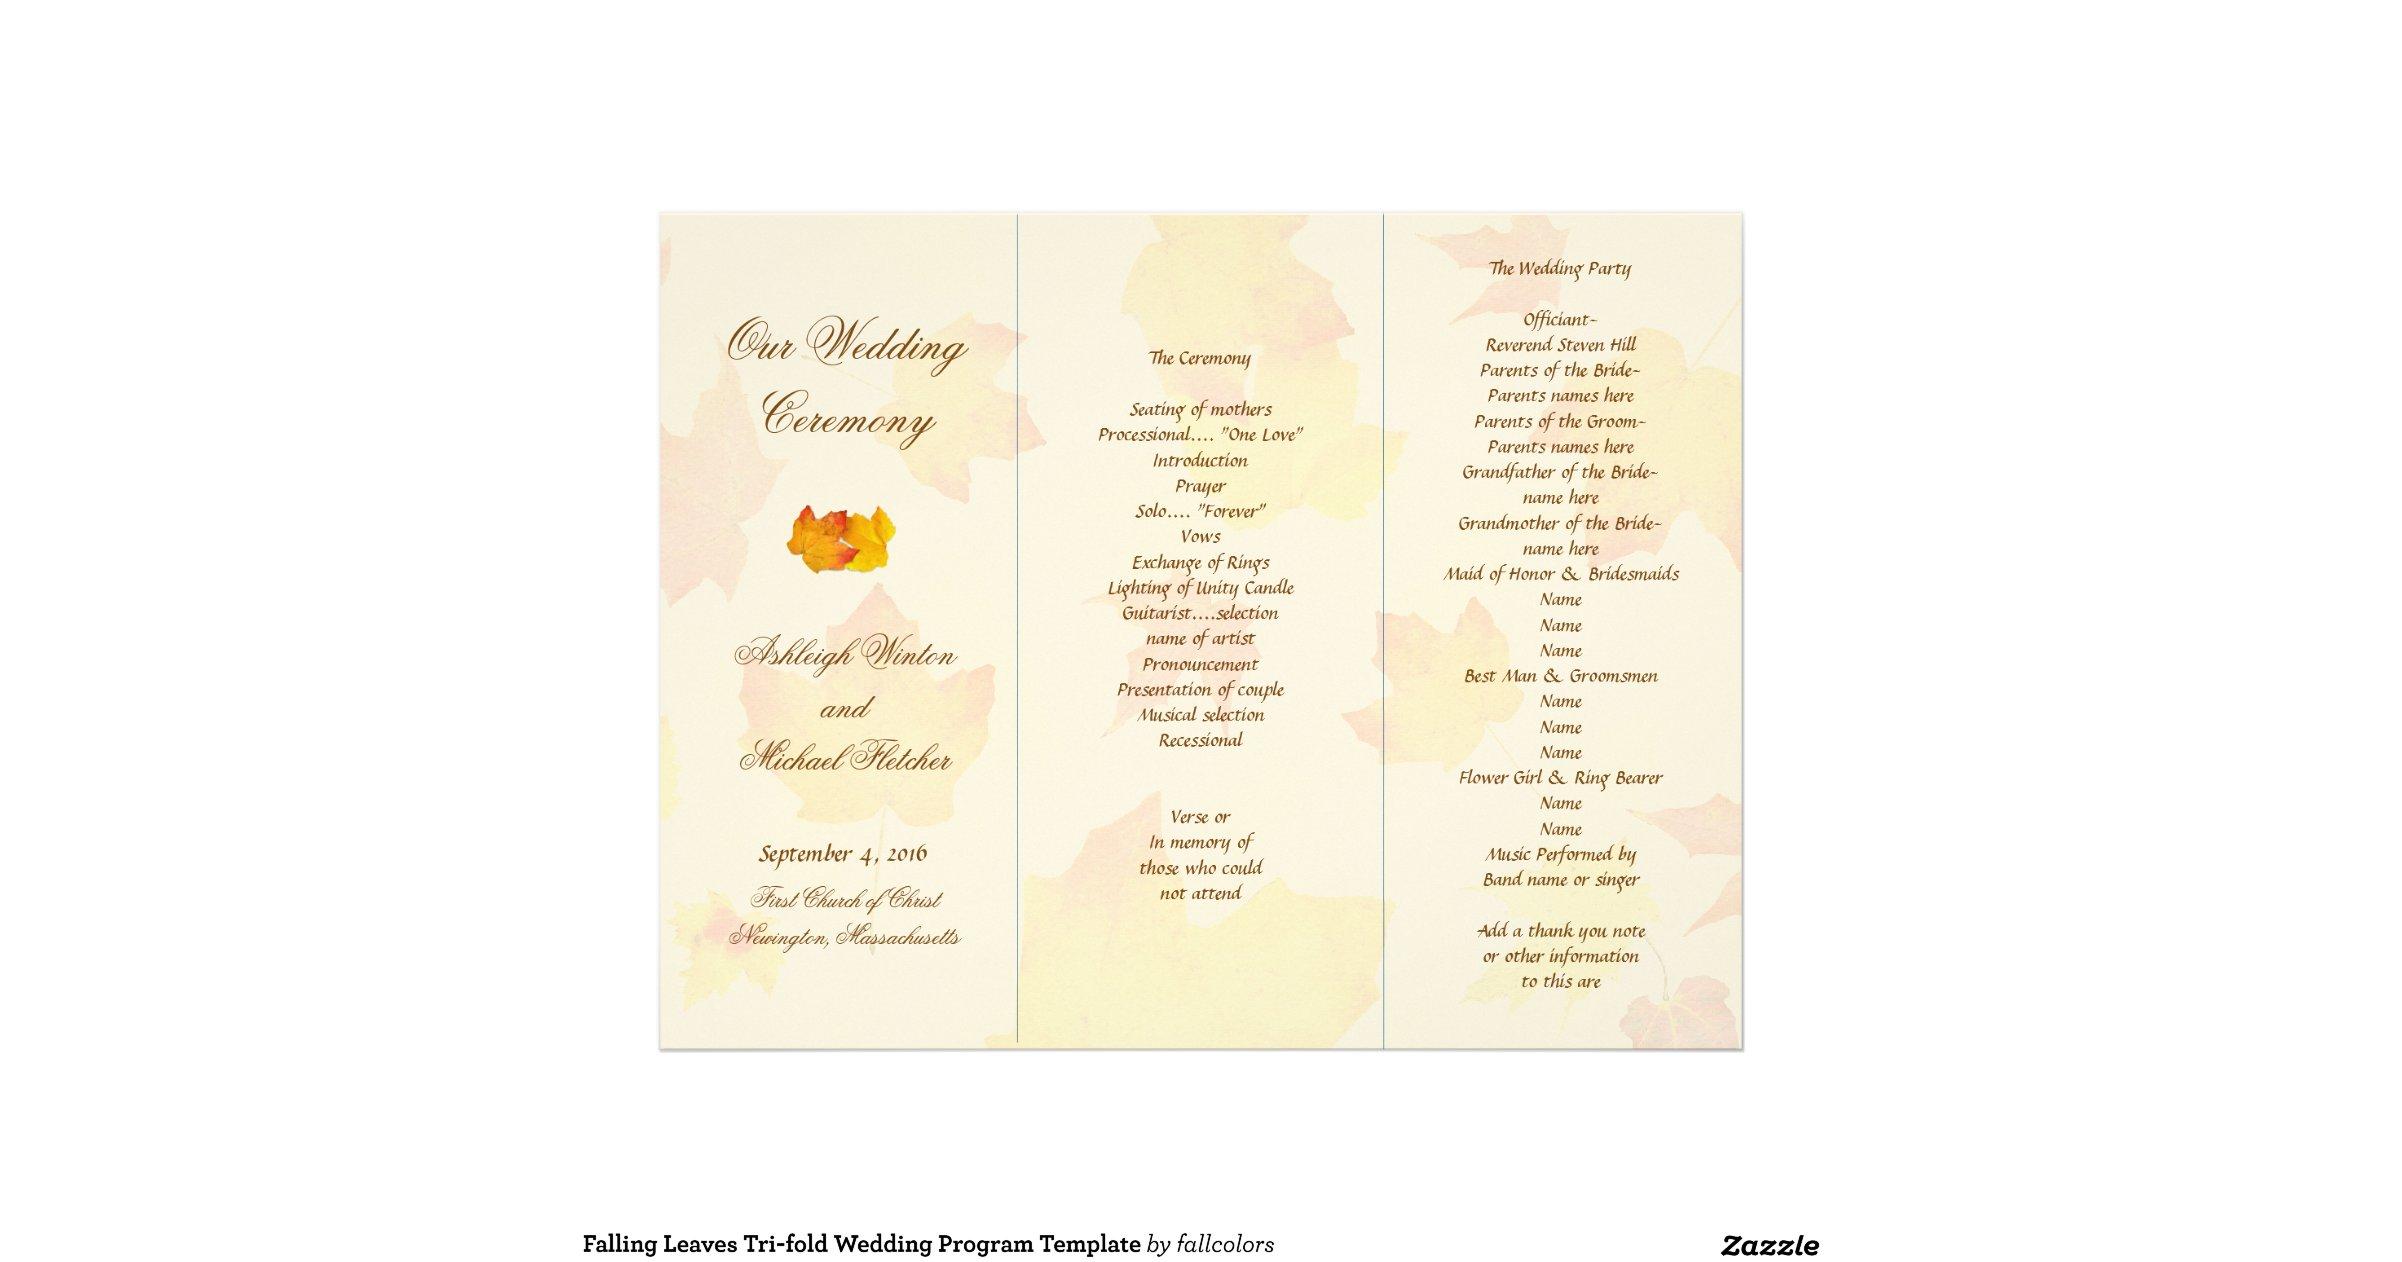 Falling Leaves Tri Fold Wedding Program Template Letterhead Rfb8a7c52fb544385931390c879d44b9f